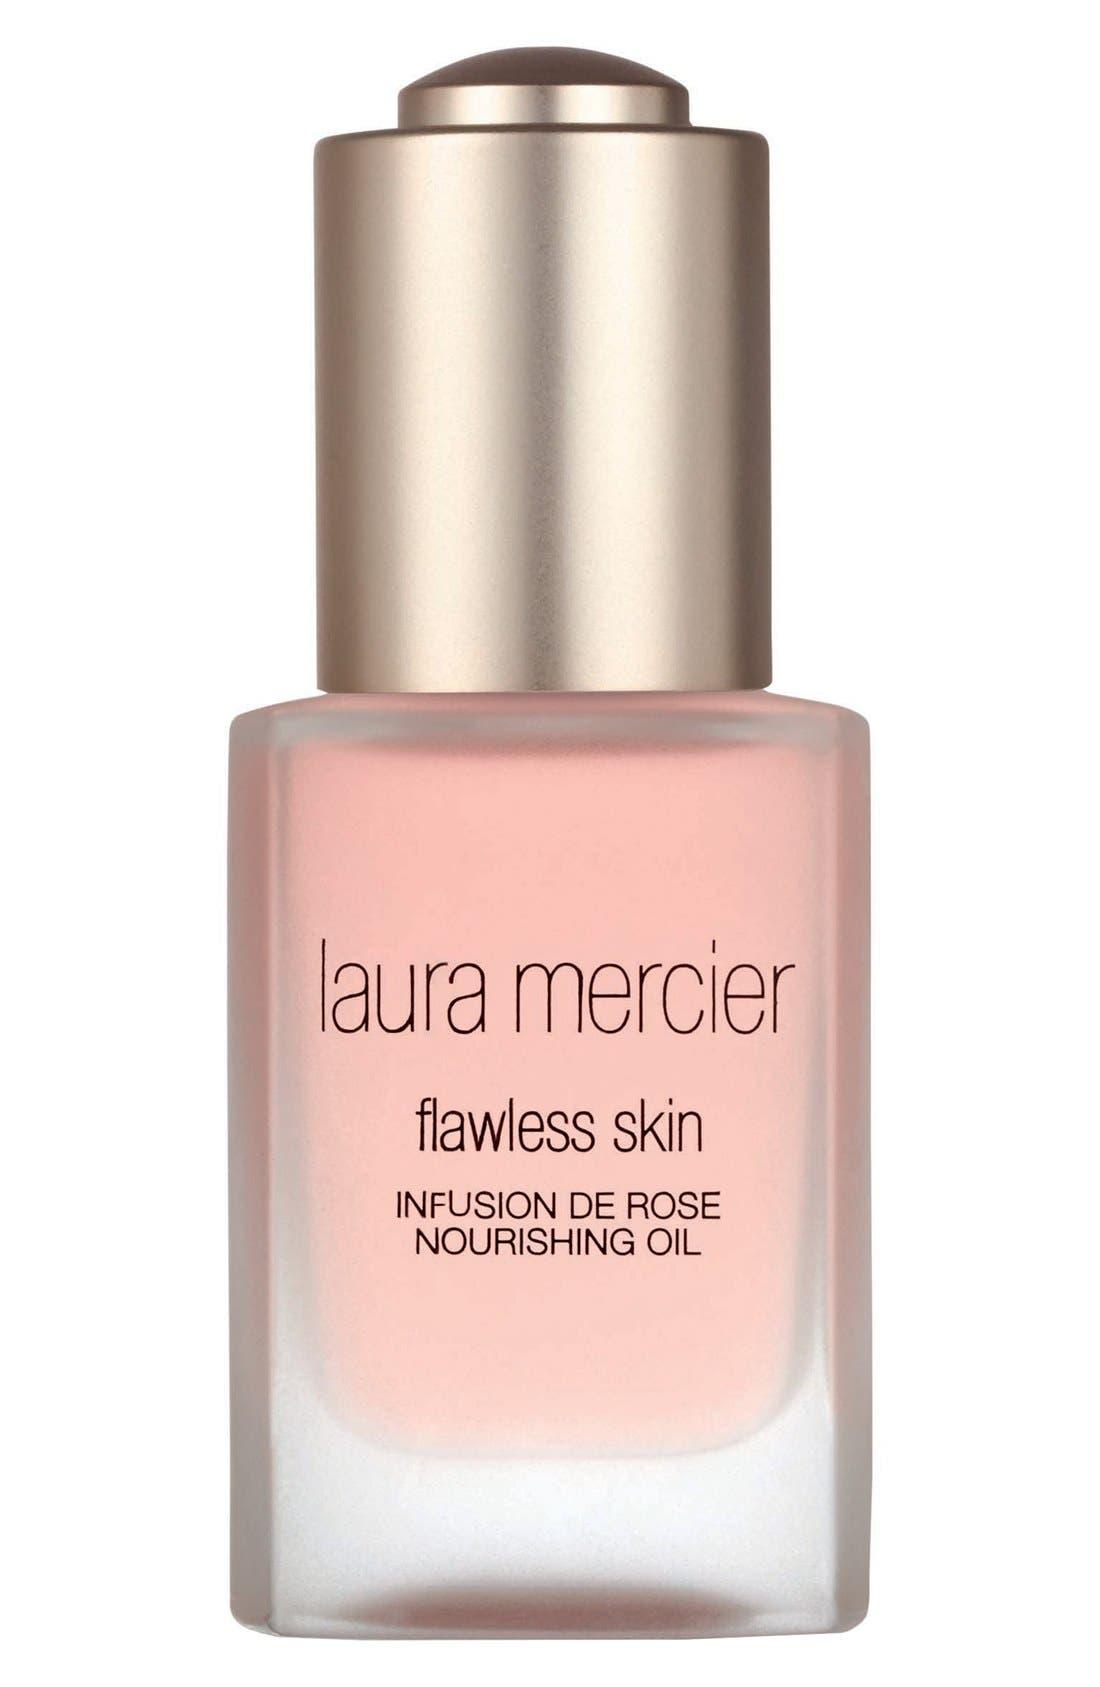 LAURA MERCIER, 'Flawless Skin' Infusion de Rose Nourishing Oil, Main thumbnail 1, color, NO COLOR